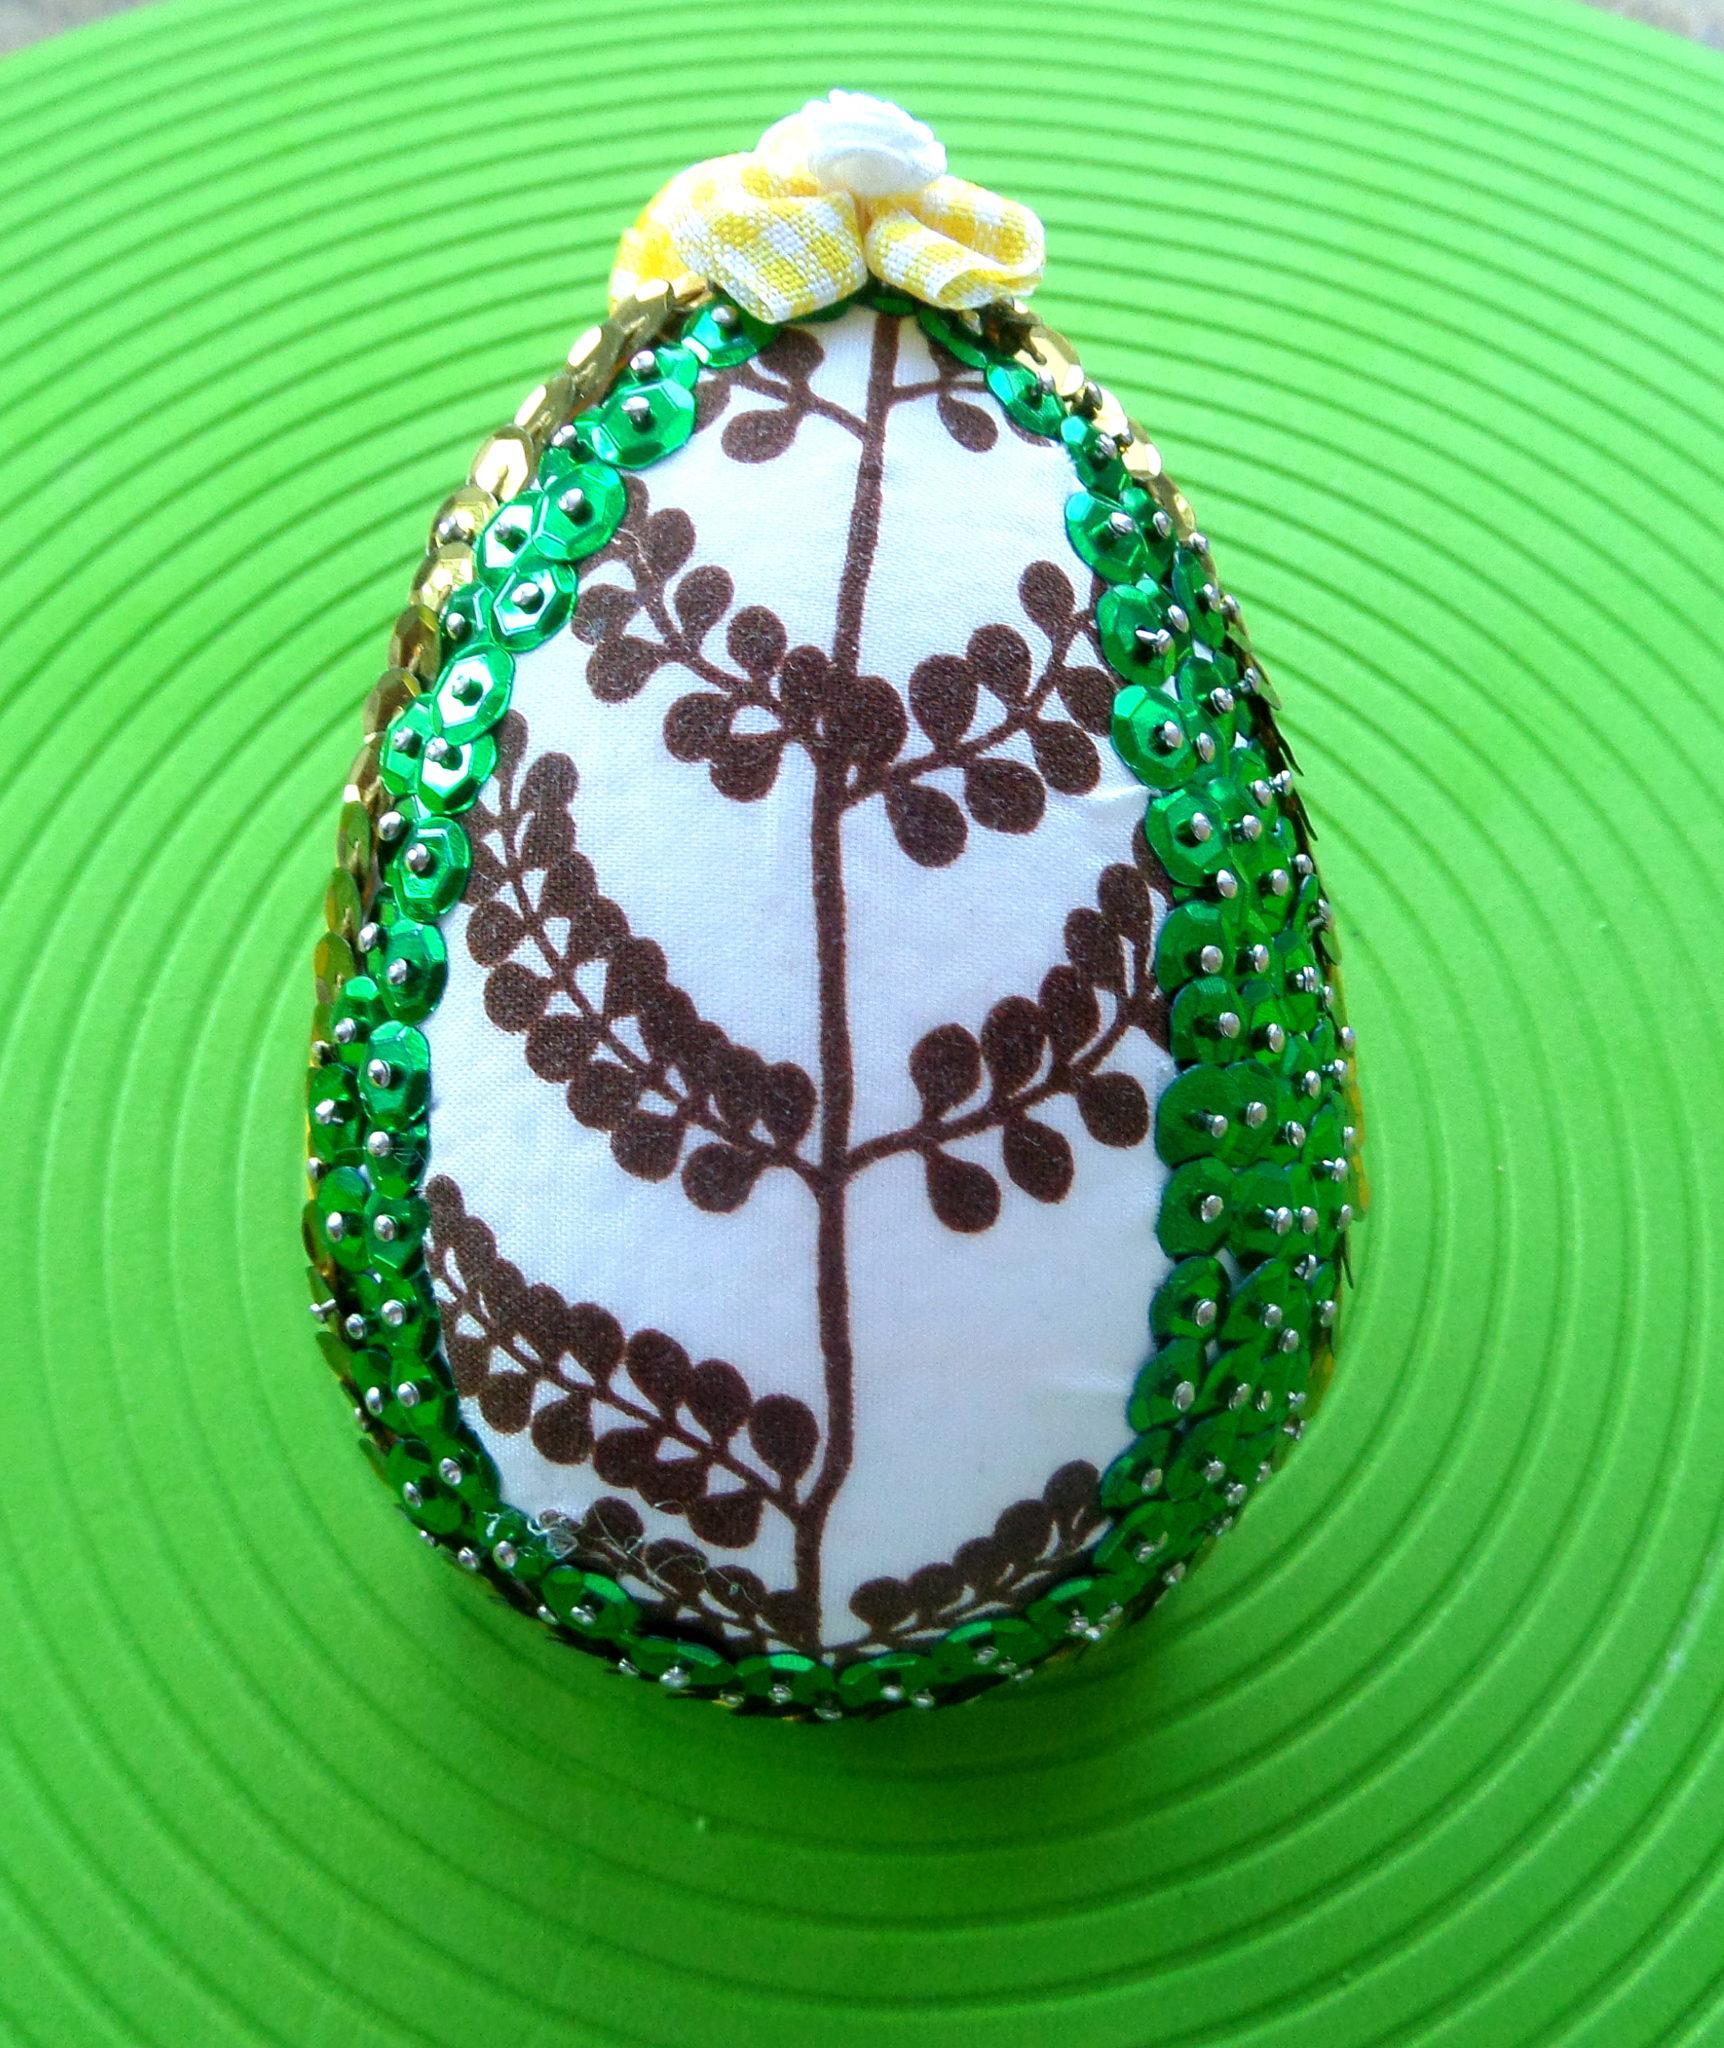 112 - Jajka styropianowe na Wielkanoc